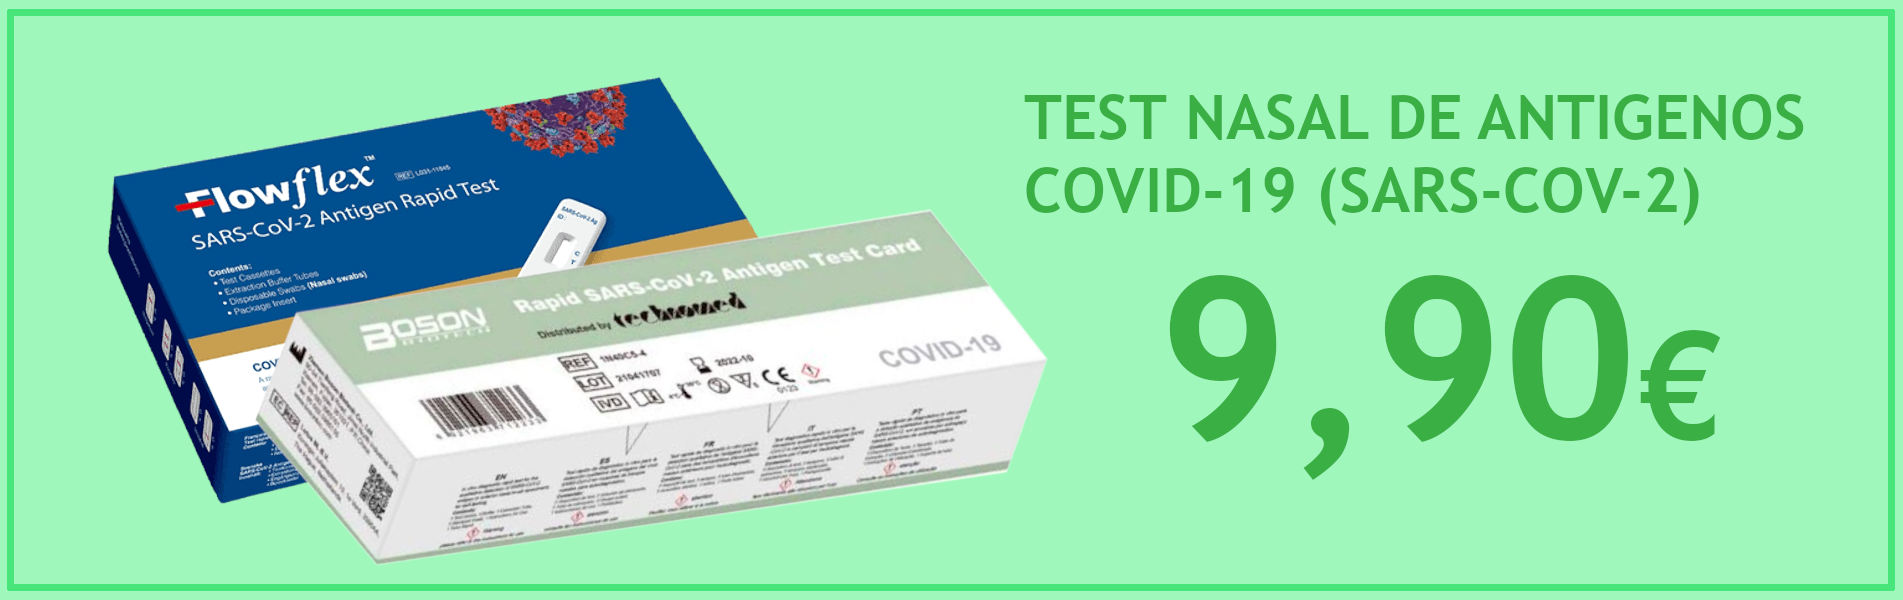 Test Antígenos COVID-19